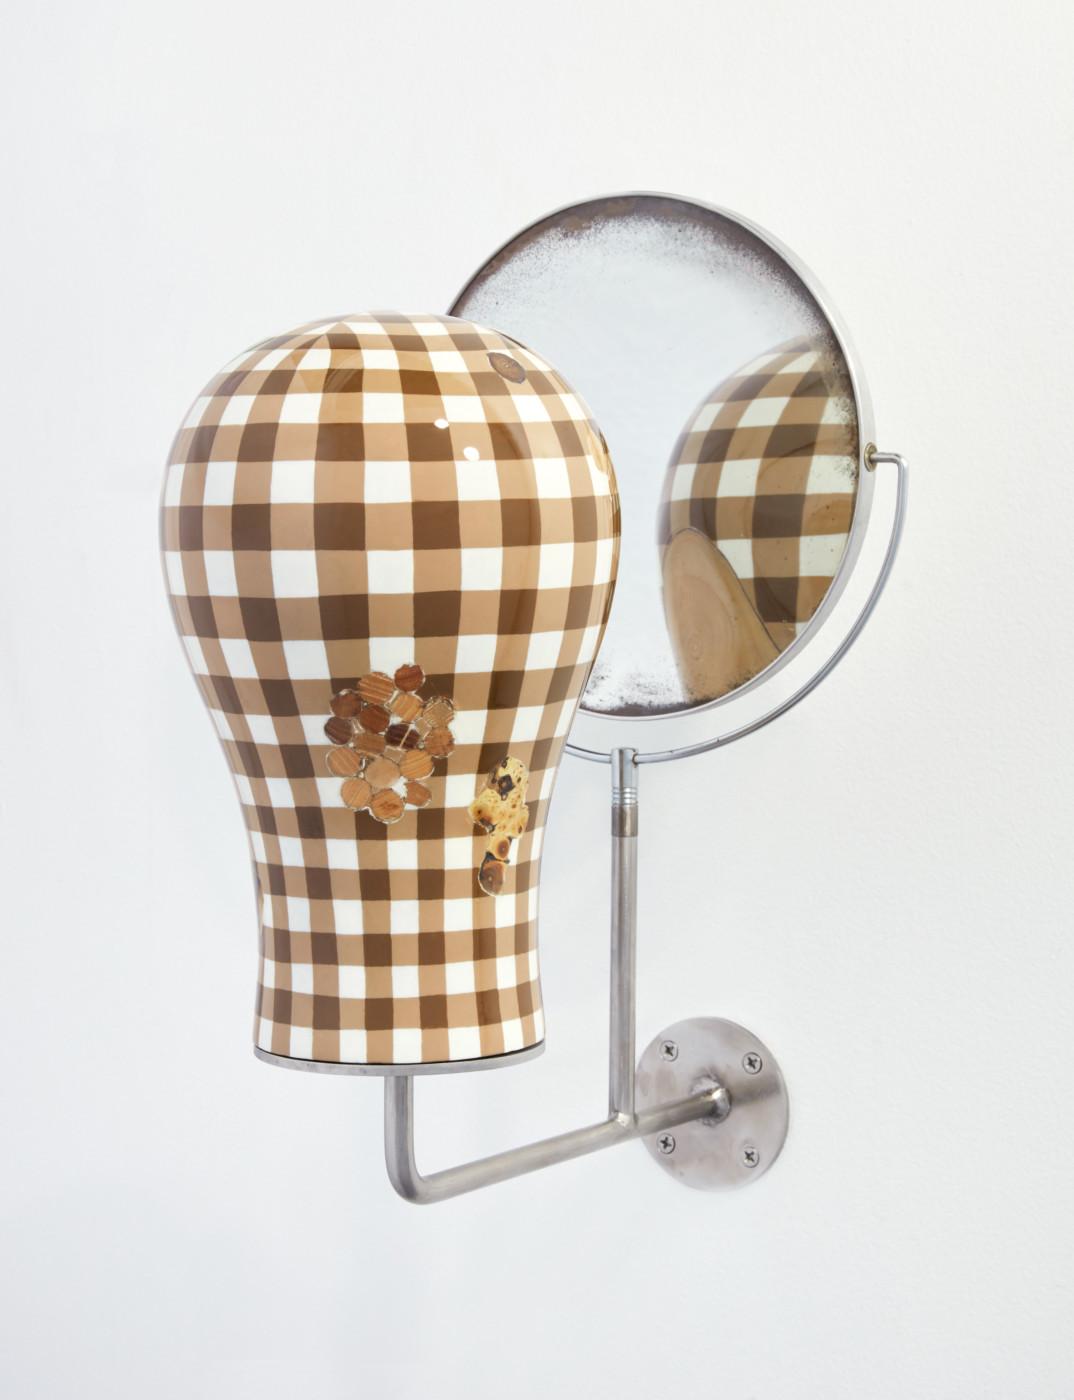 TÊTE  Tête fig. 4</I>, 2019 Acrylic, enamel, wood, steel, mirror 49 x 29 x 37 cm / 19 1/4 x 11 3/8 x 14 5/8 in  ORION MARTIN